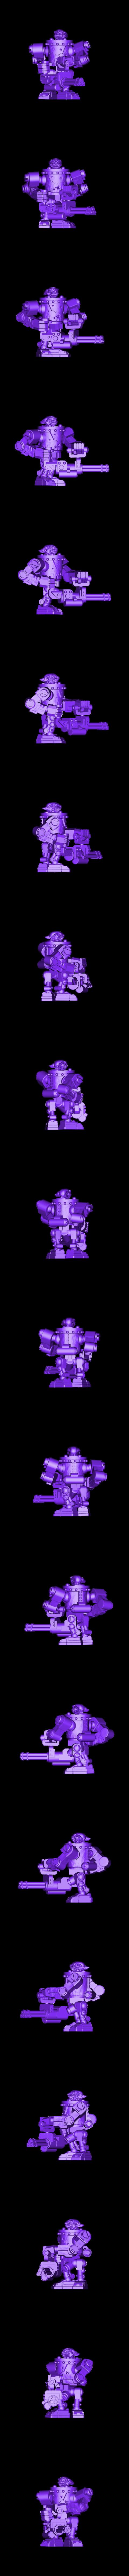 Goblin_Robot.stl Download free STL file Goblin bot • 3D print model, duncanshadow